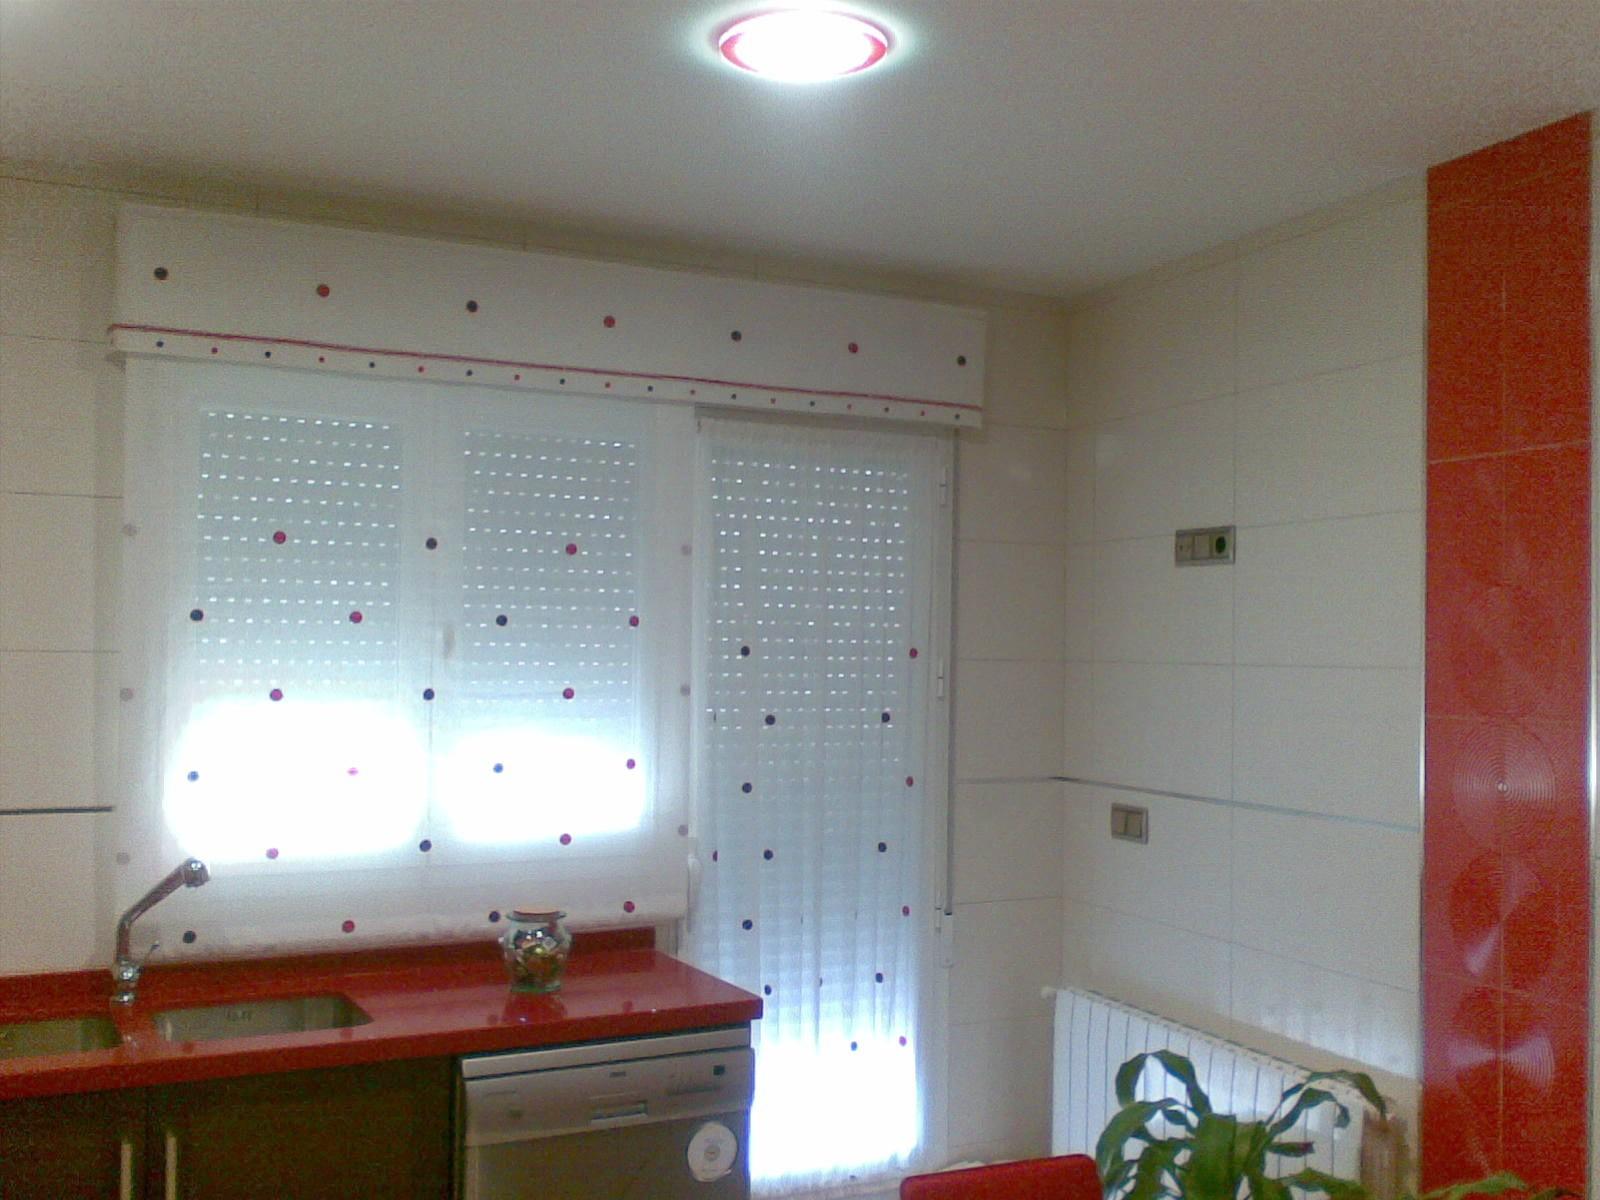 Decoracion mueble sofa cortinas cocina puerta terraza for Cortinas visillos para cocina